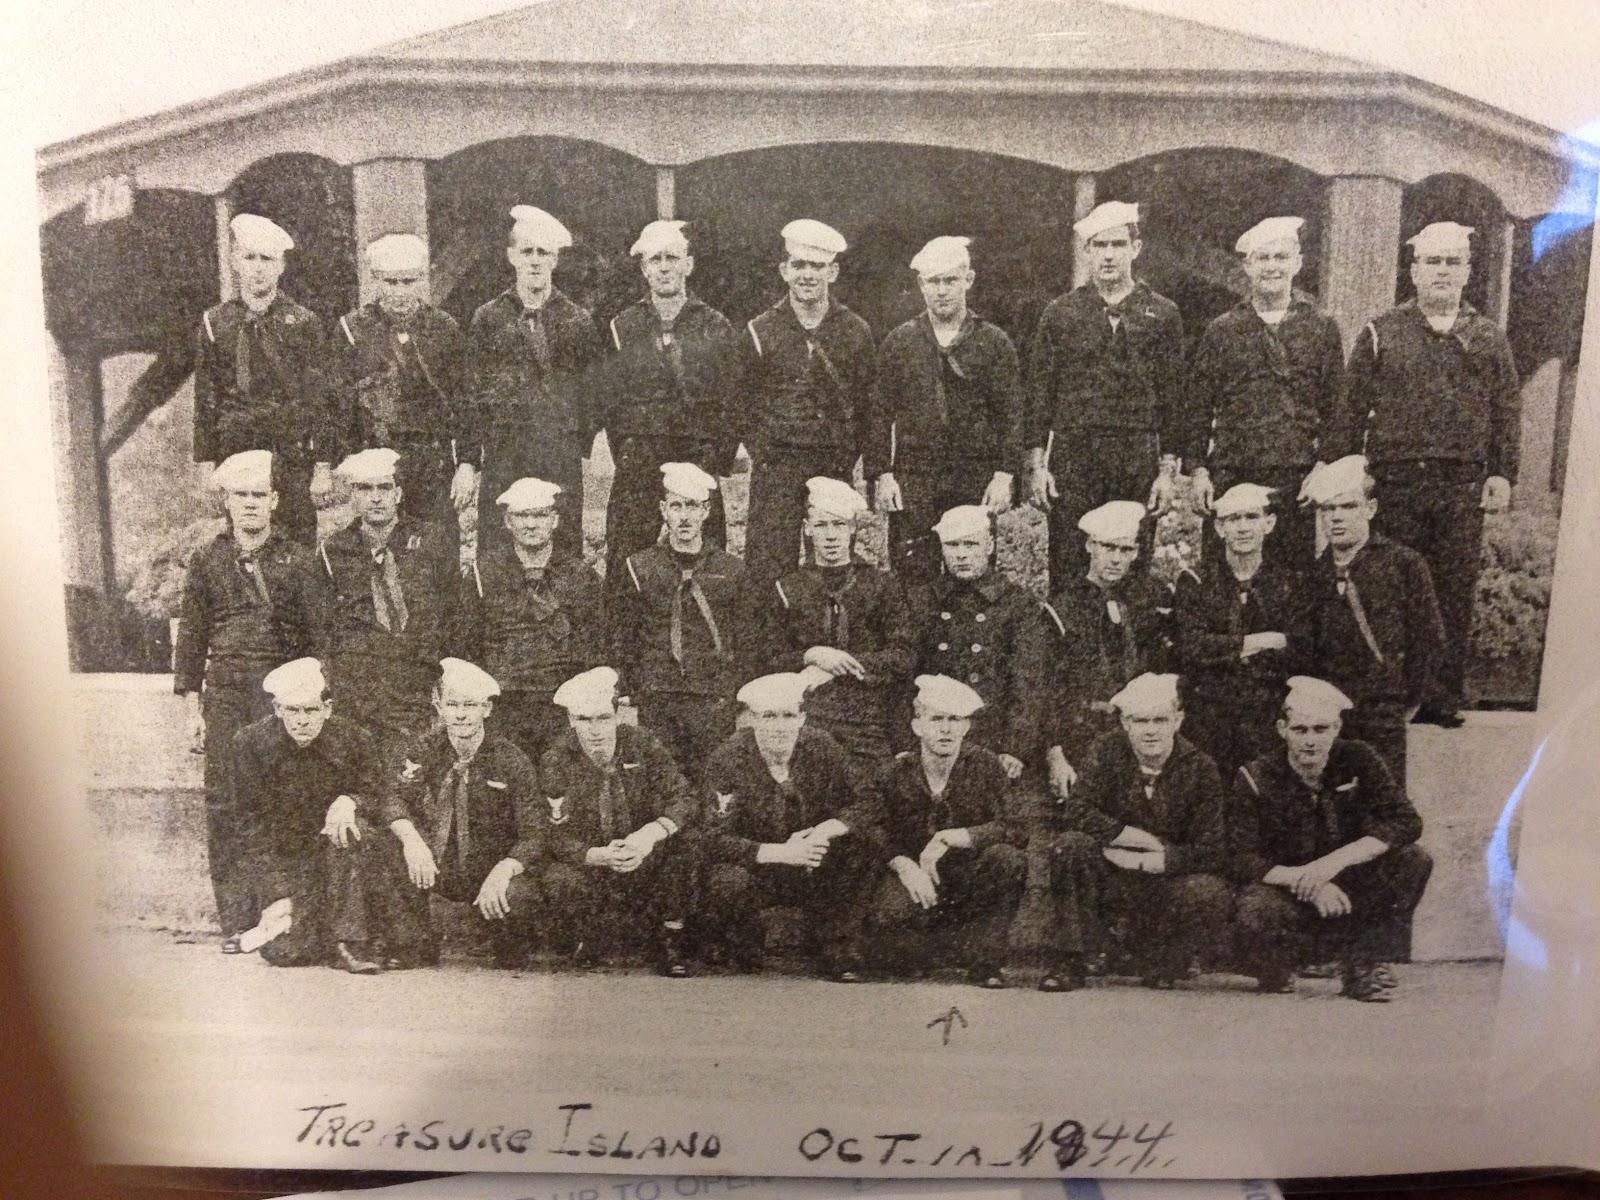 Lee Bergmeier Treasure Island Oct 1944.jpg